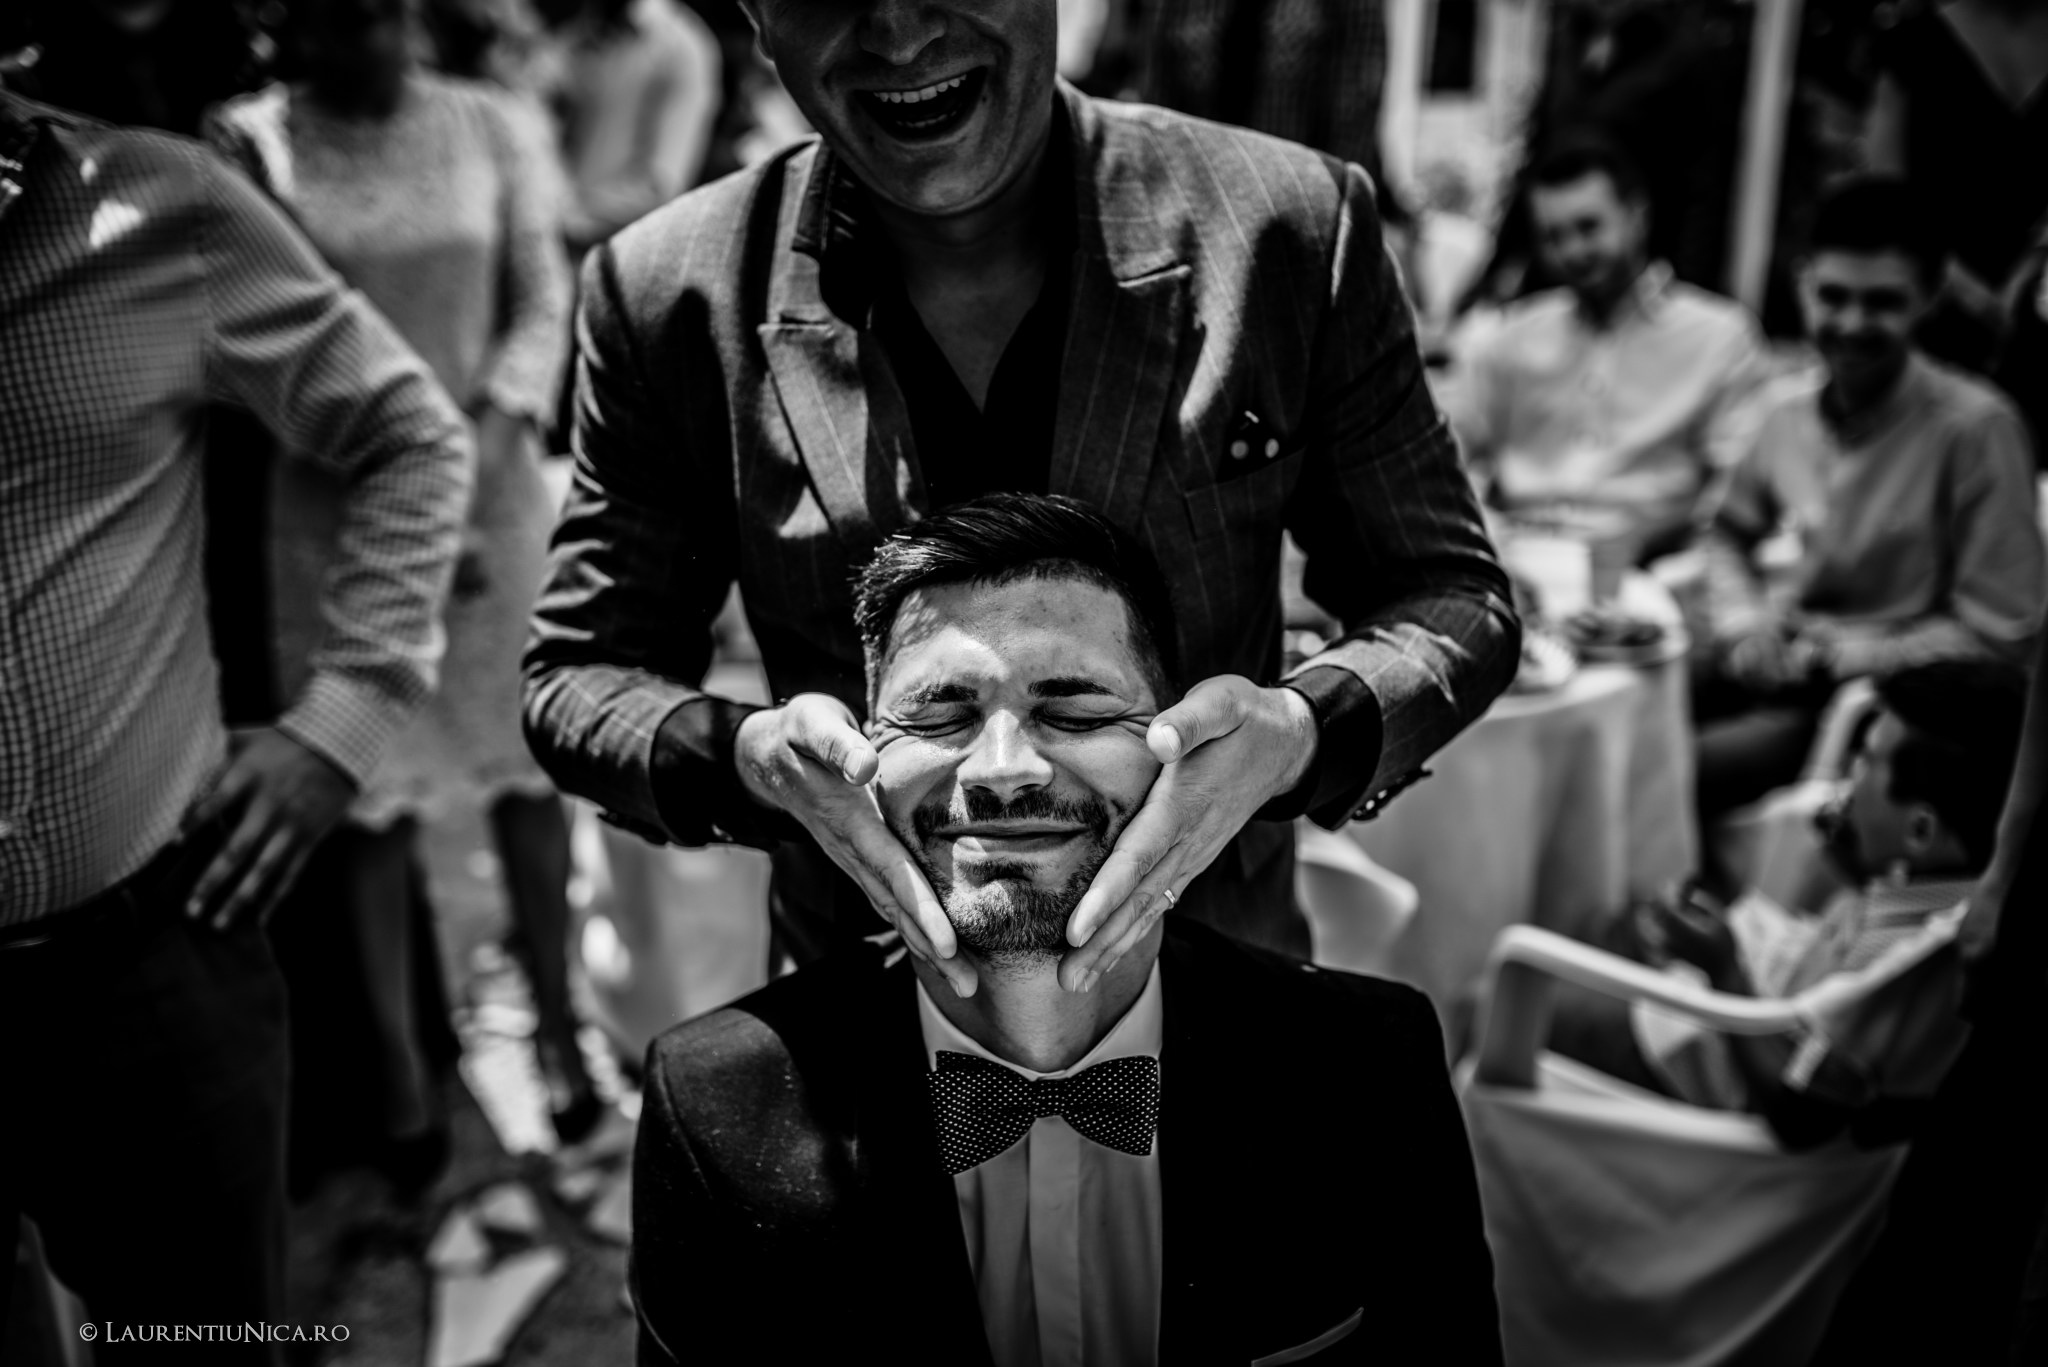 madalina madalin fotograf nunta laurentiu nica turceni gorj 11 - Madalina & Madalin | Fotografii nunta | Judetul Gorj